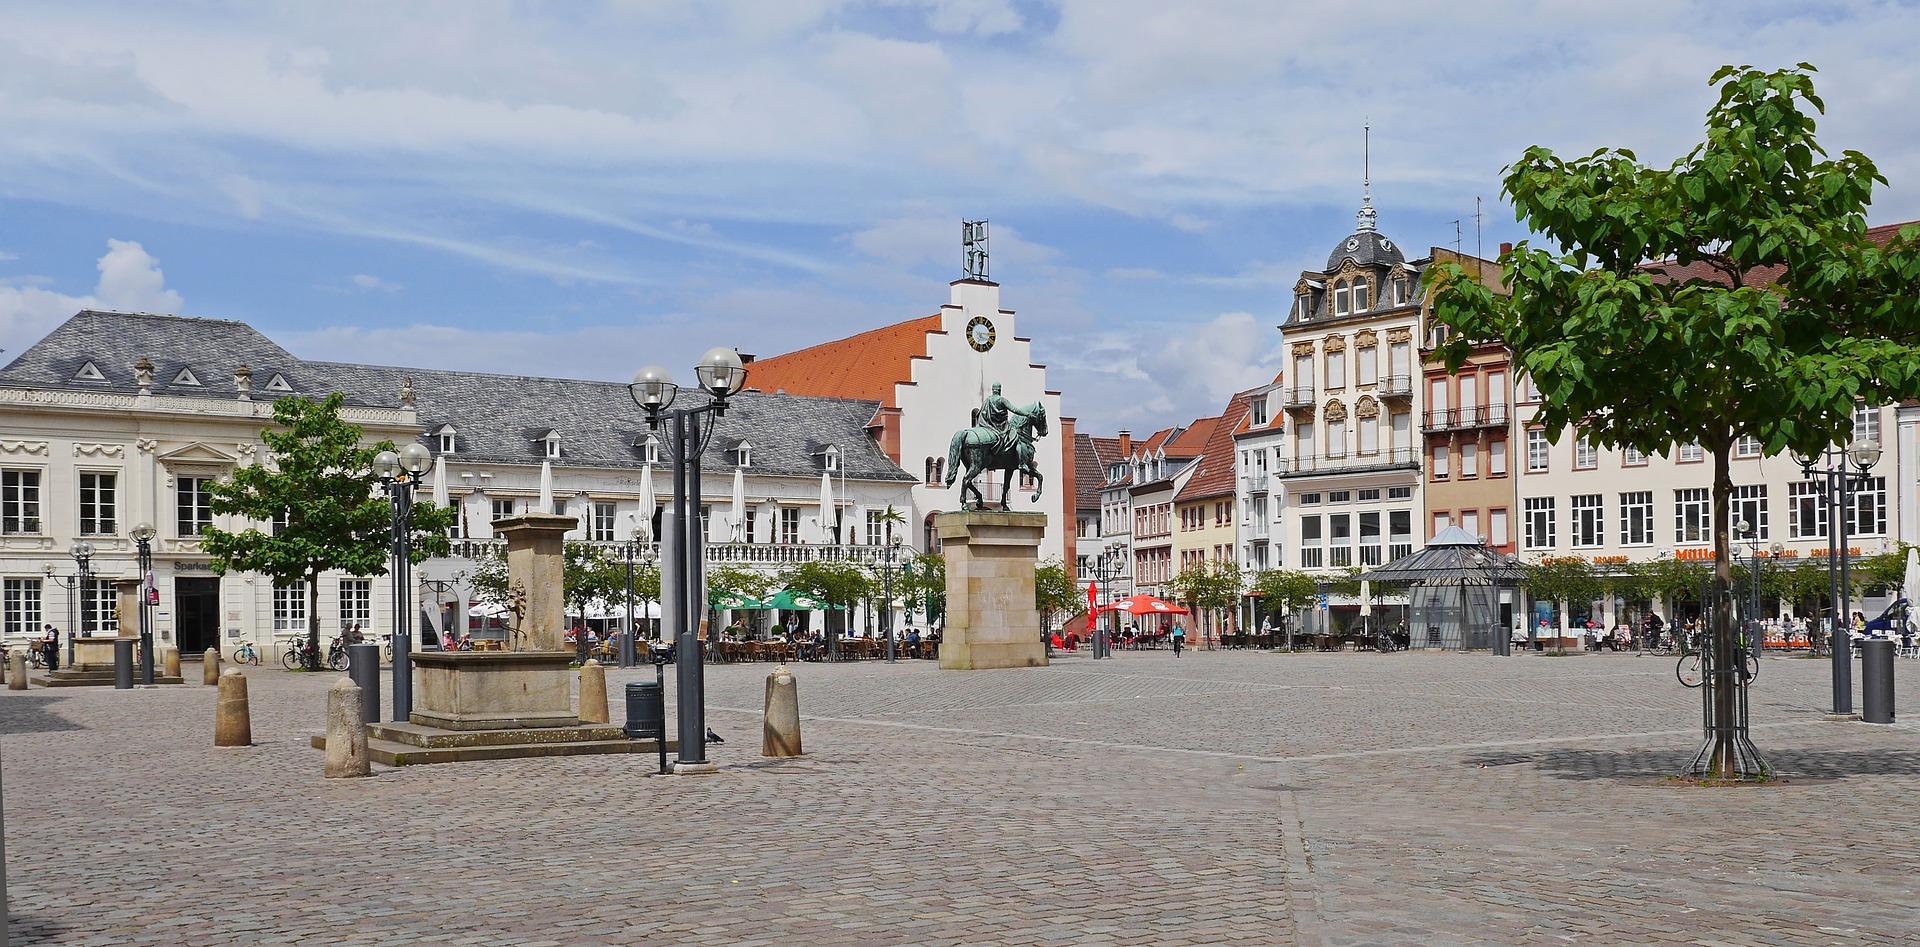 DJ in Landau in der Pfalz